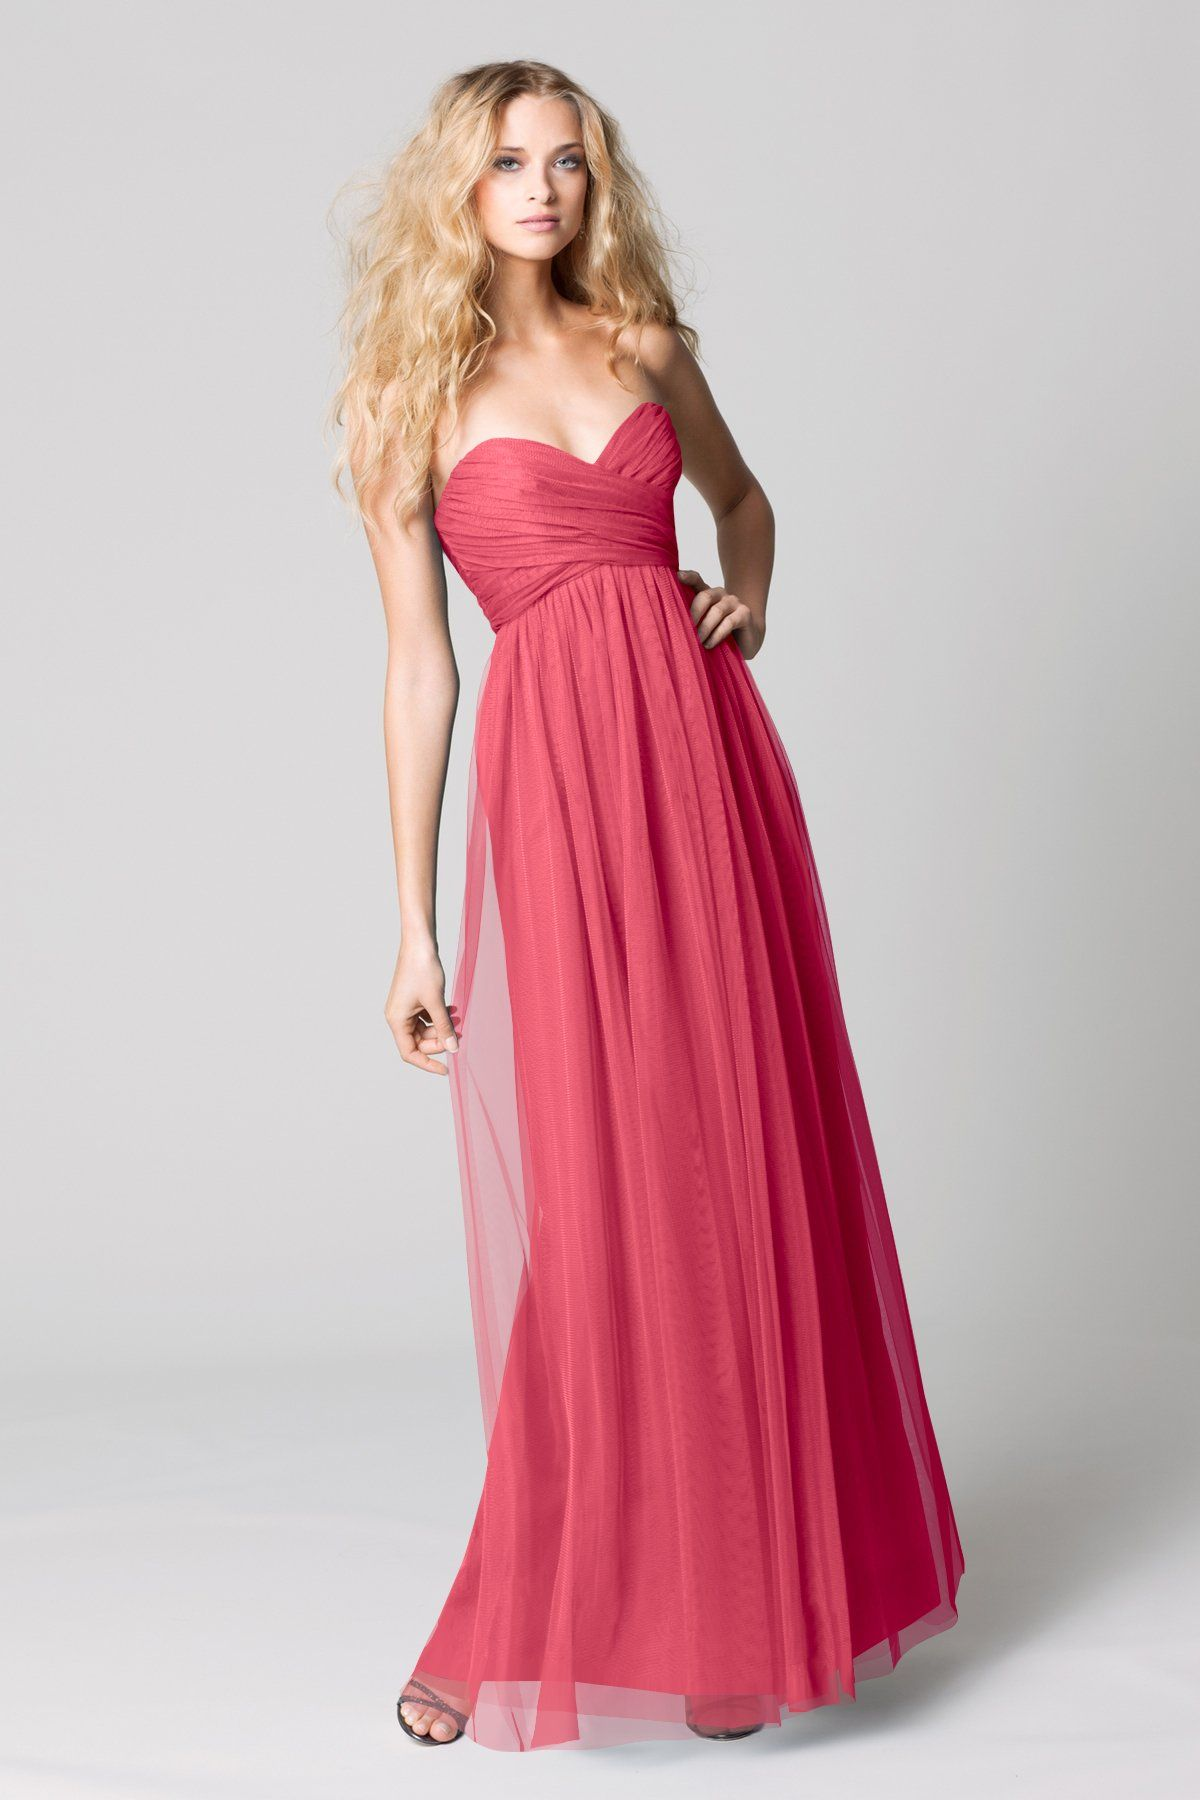 Wtoo 337 Bridesmaid Dress watermelon bobbinet | Fashionn | Pinterest ...